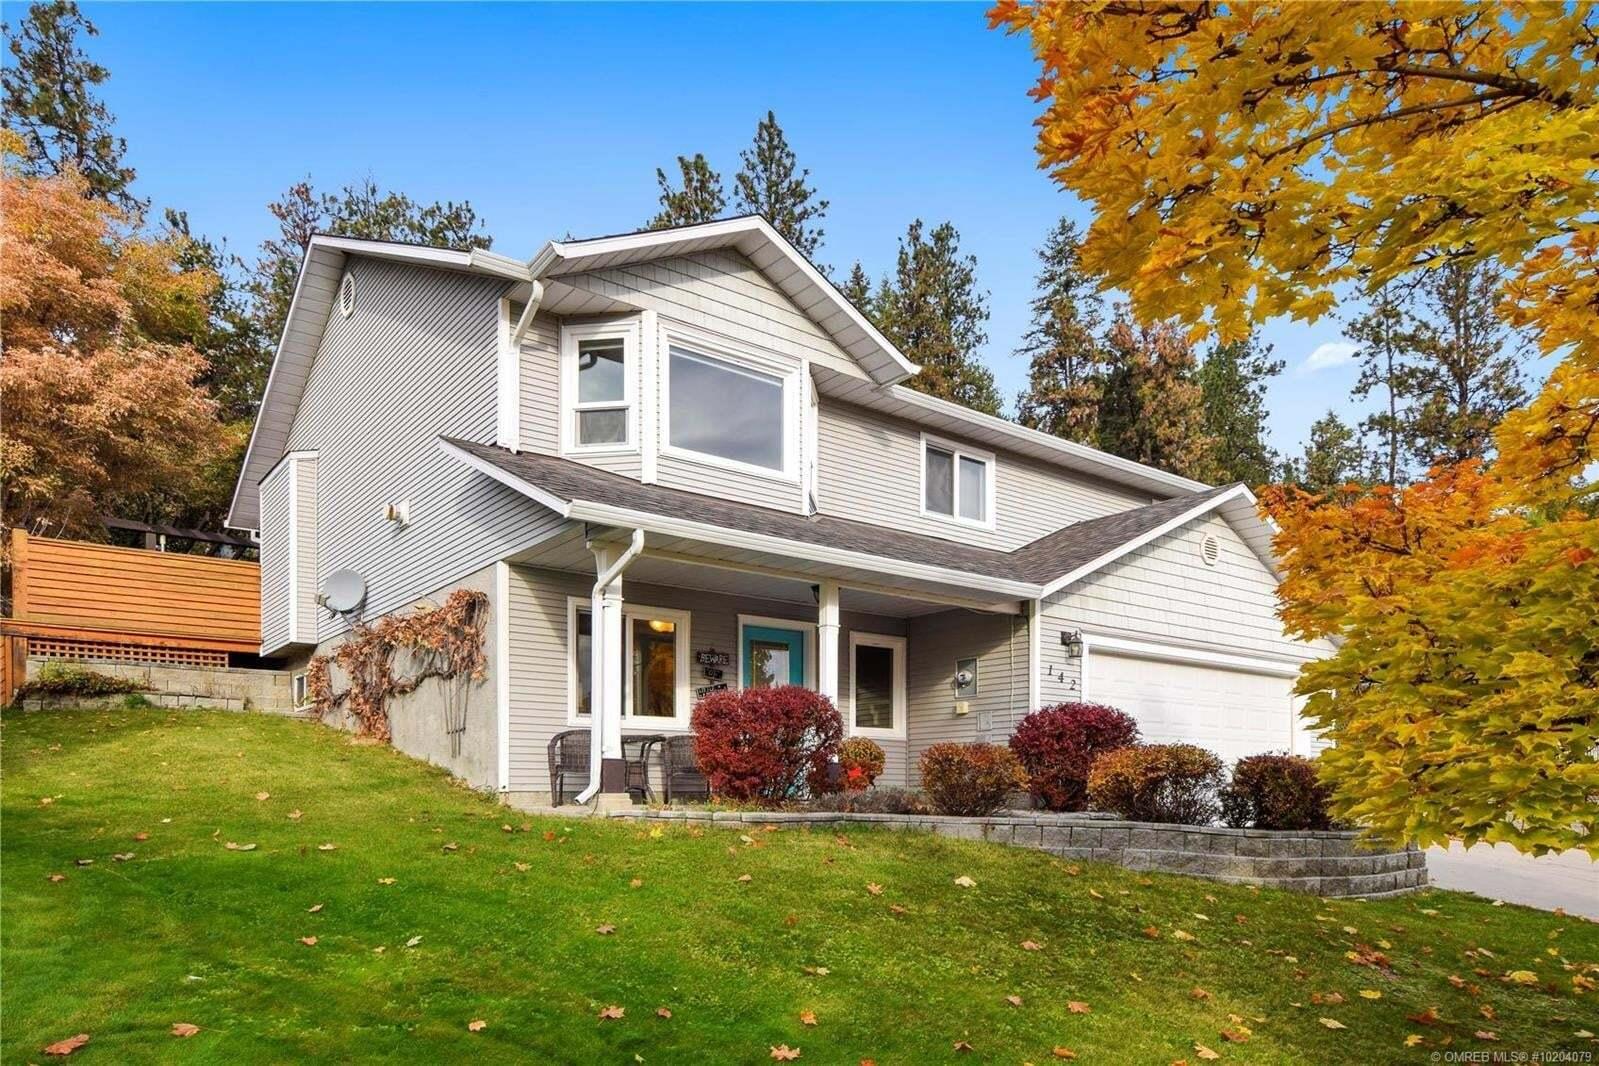 House for sale at 142 Drake Rd Kelowna British Columbia - MLS: 10204079